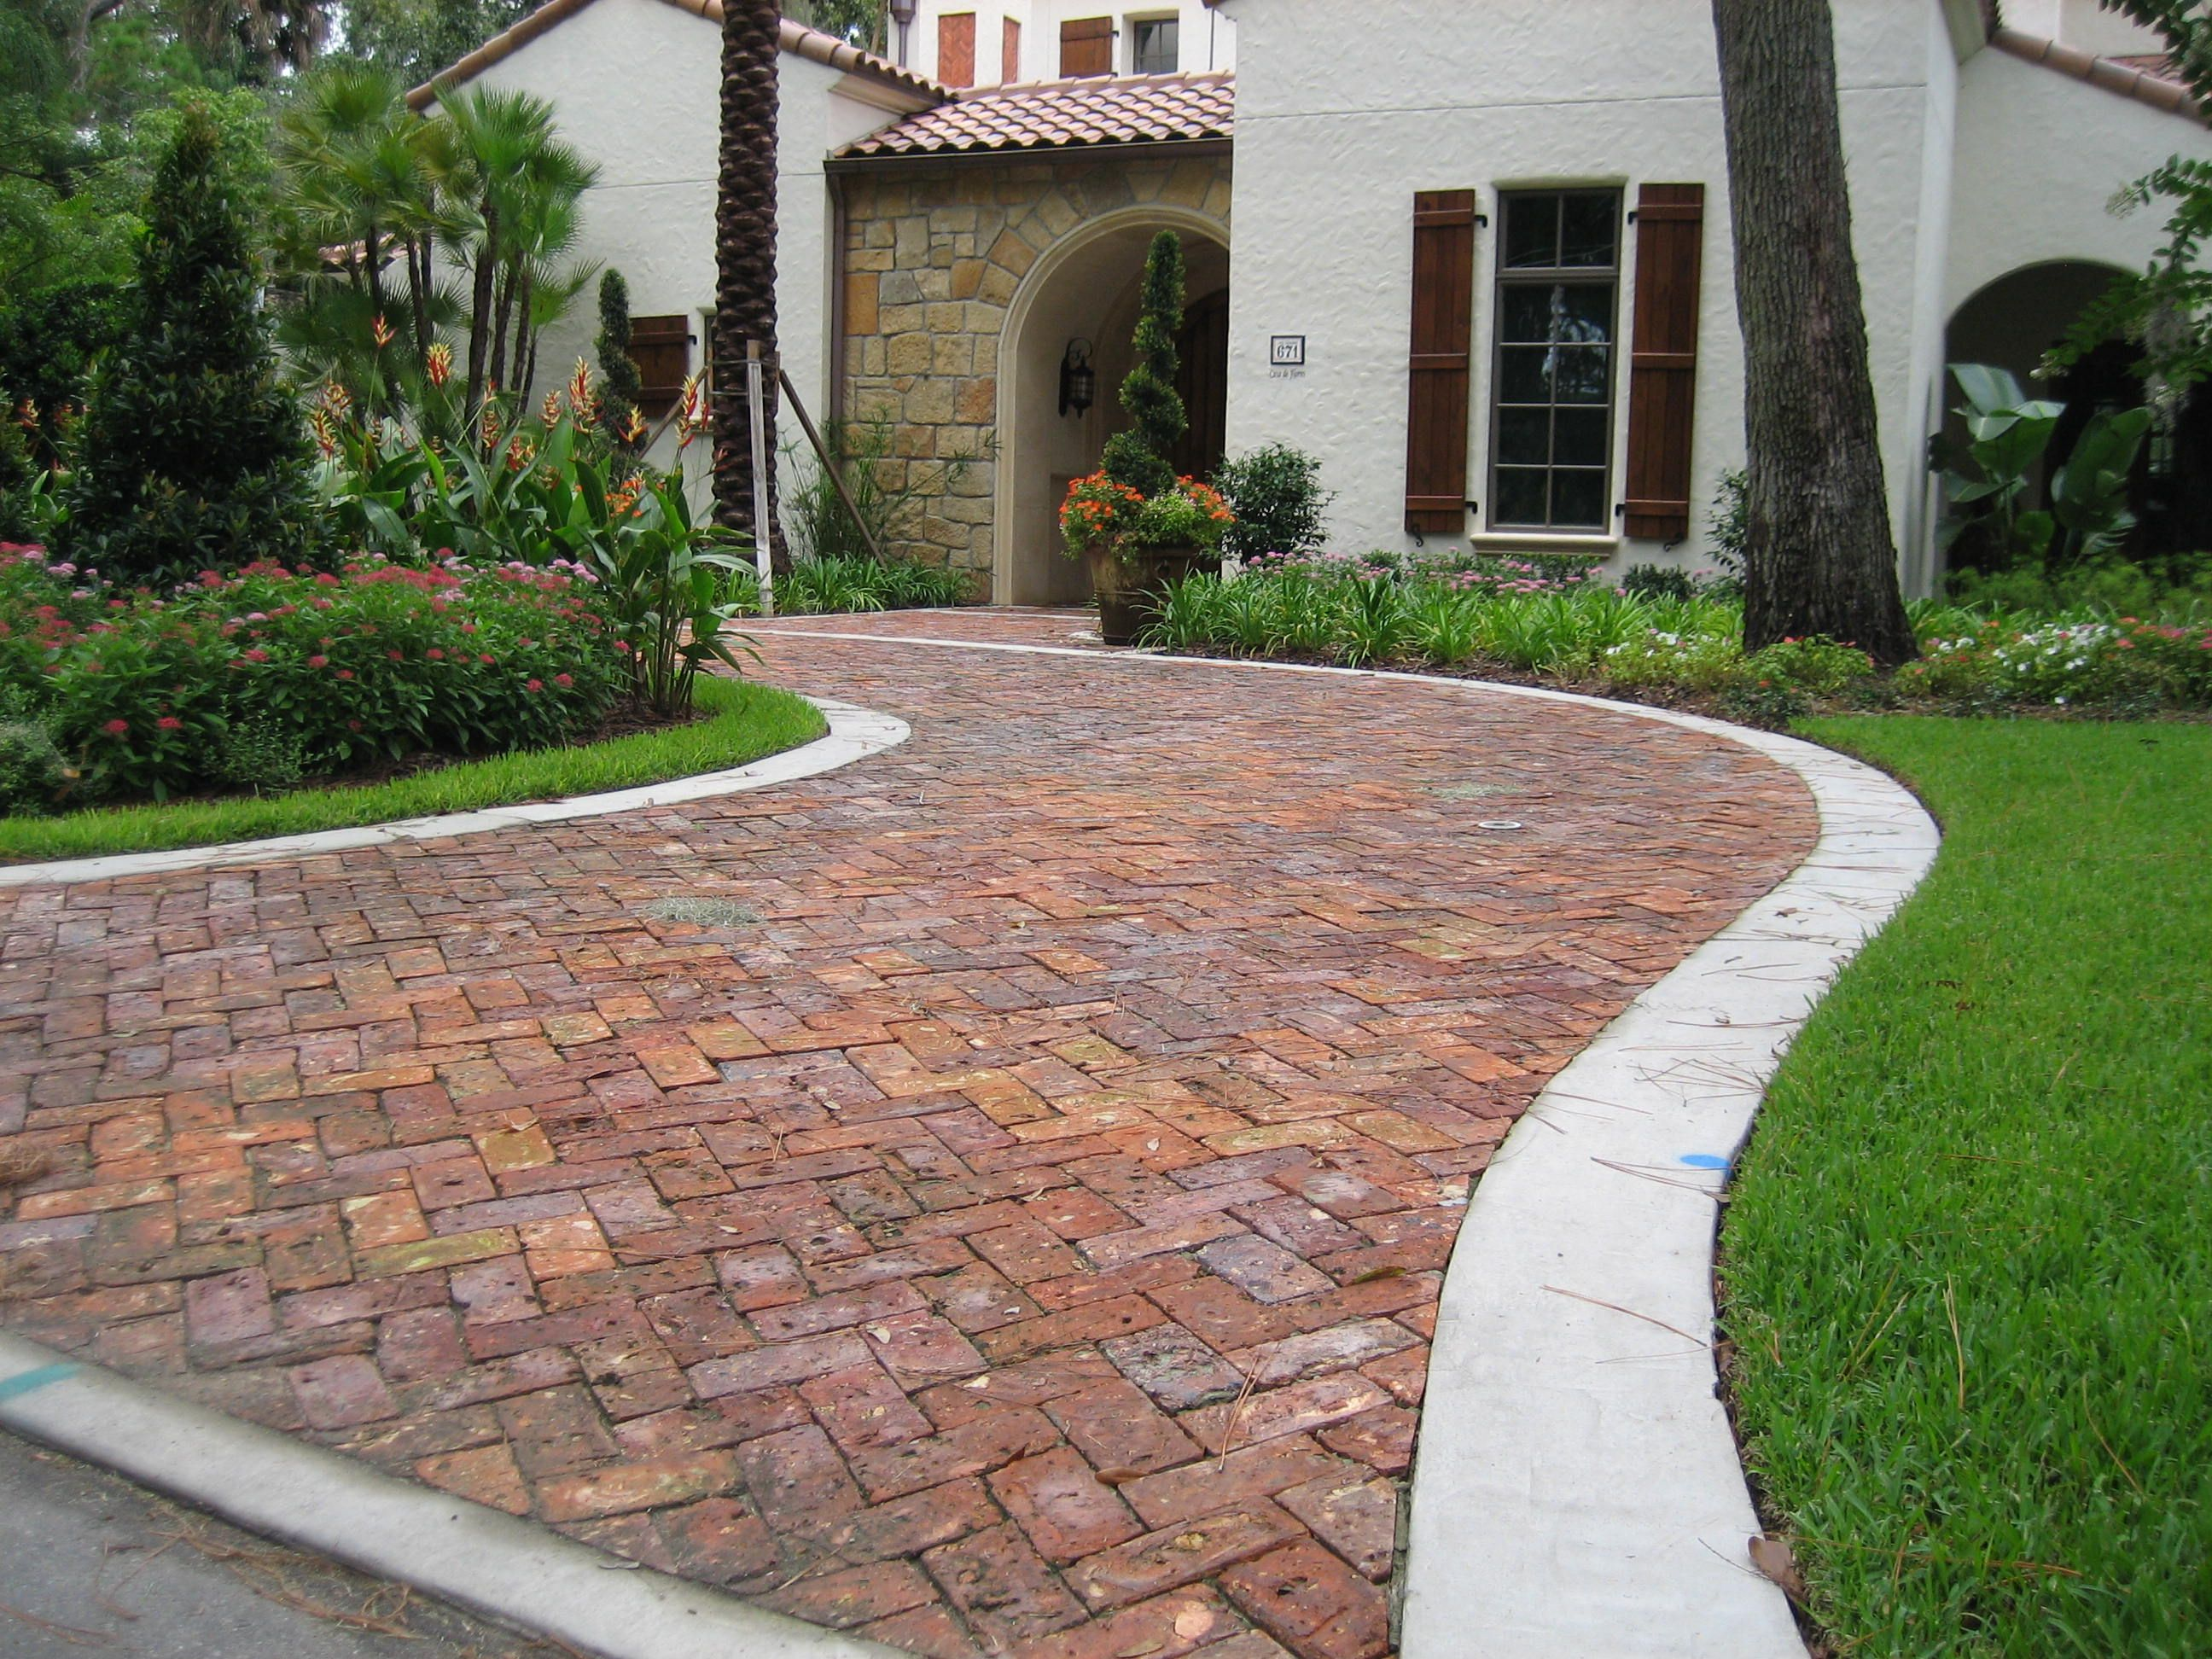 interlocking pavers for home driveways amp walkways - HD2592×1944